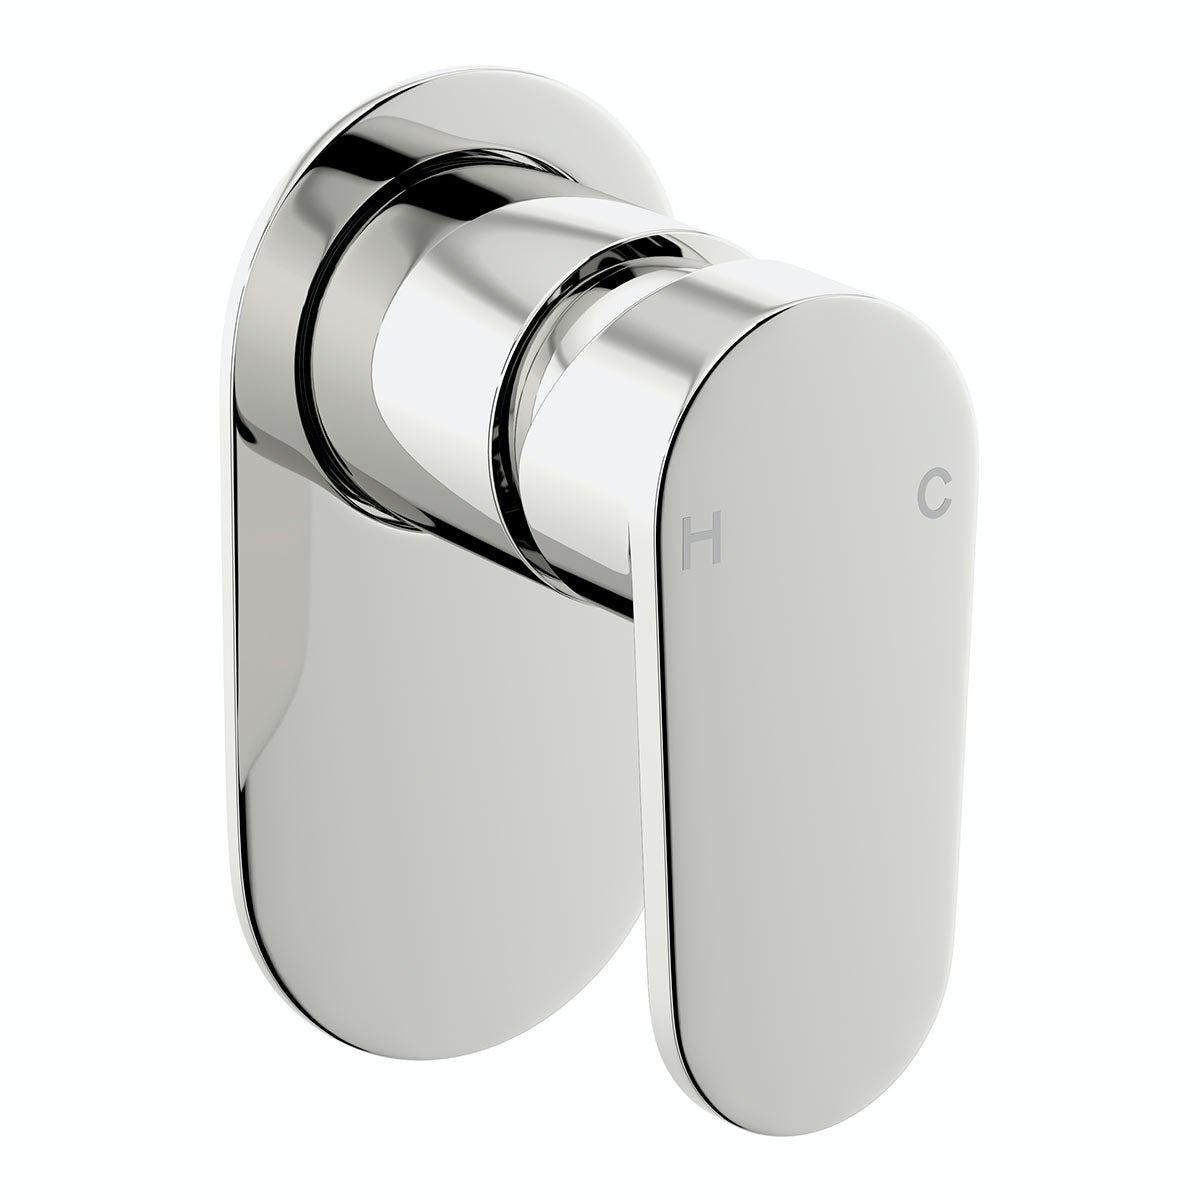 orchard round manual shower valve - Shower Valves